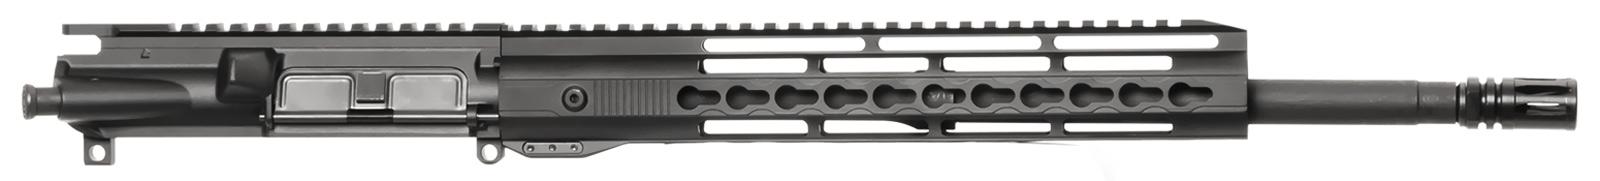 ar-15-upper-assembly-16-9mm-1-10-12-hera-arms-unmarked-keymod-ar-15-handguard-rail-non-lock-back